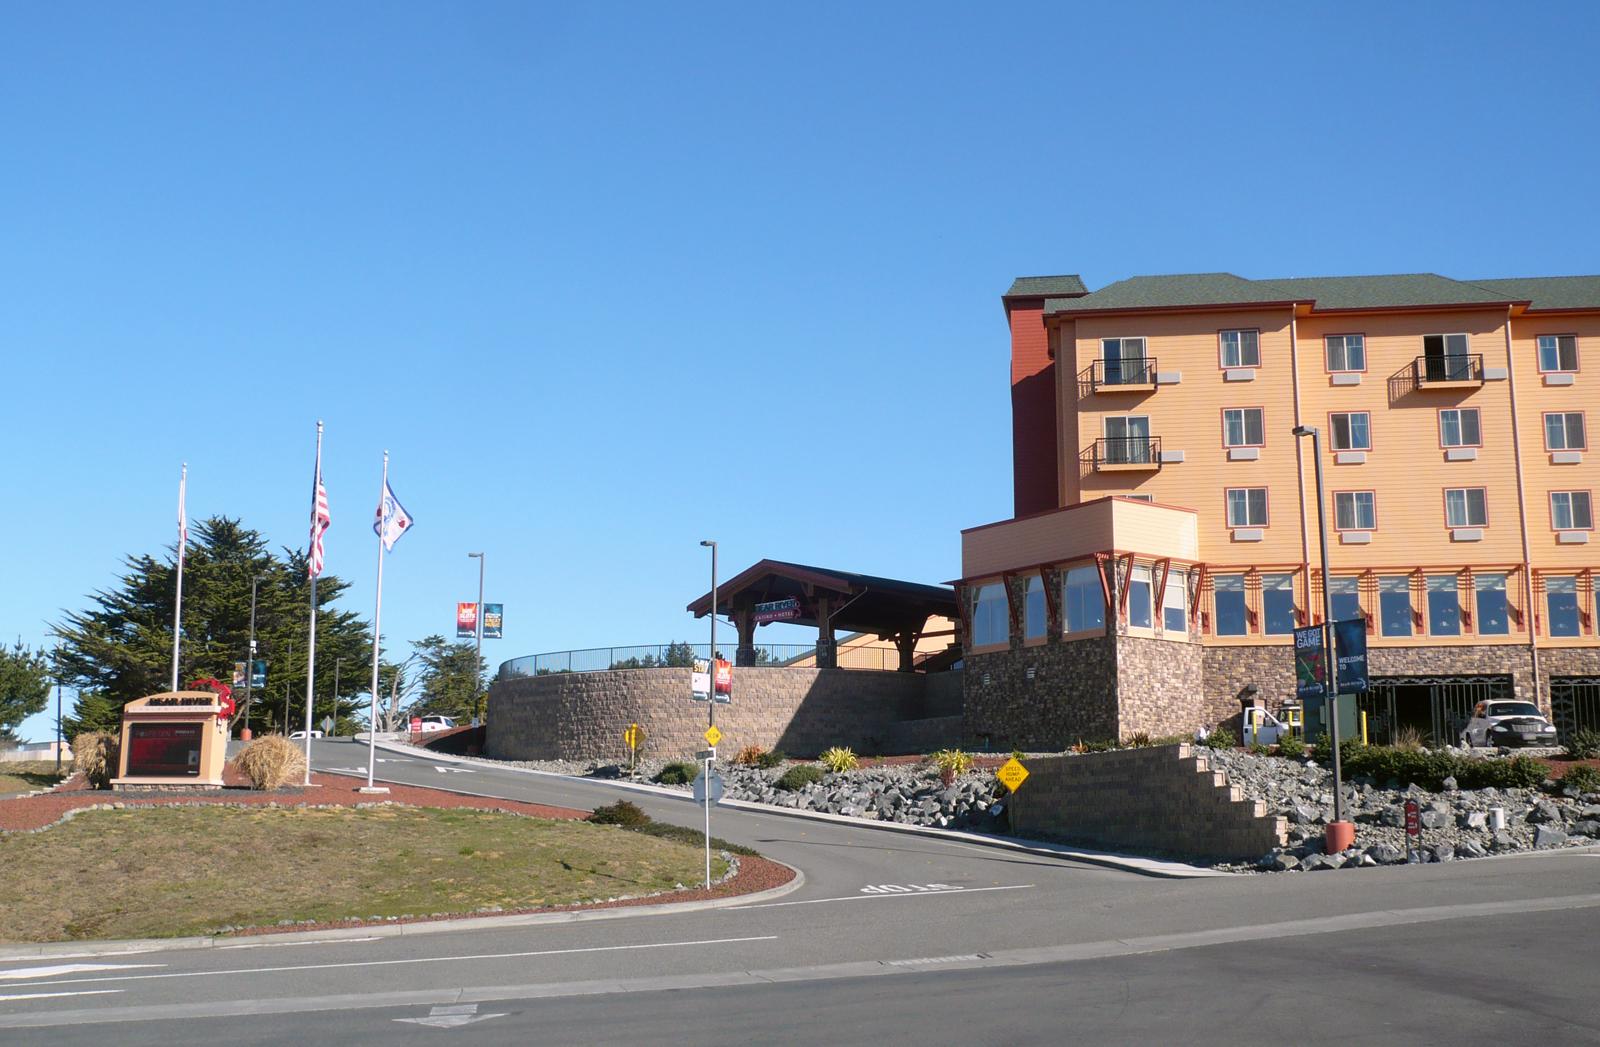 https://upload.wikimedia.org/wikipedia/commons/8/84/Loleta_CA_Bear_River_Casino.jpg